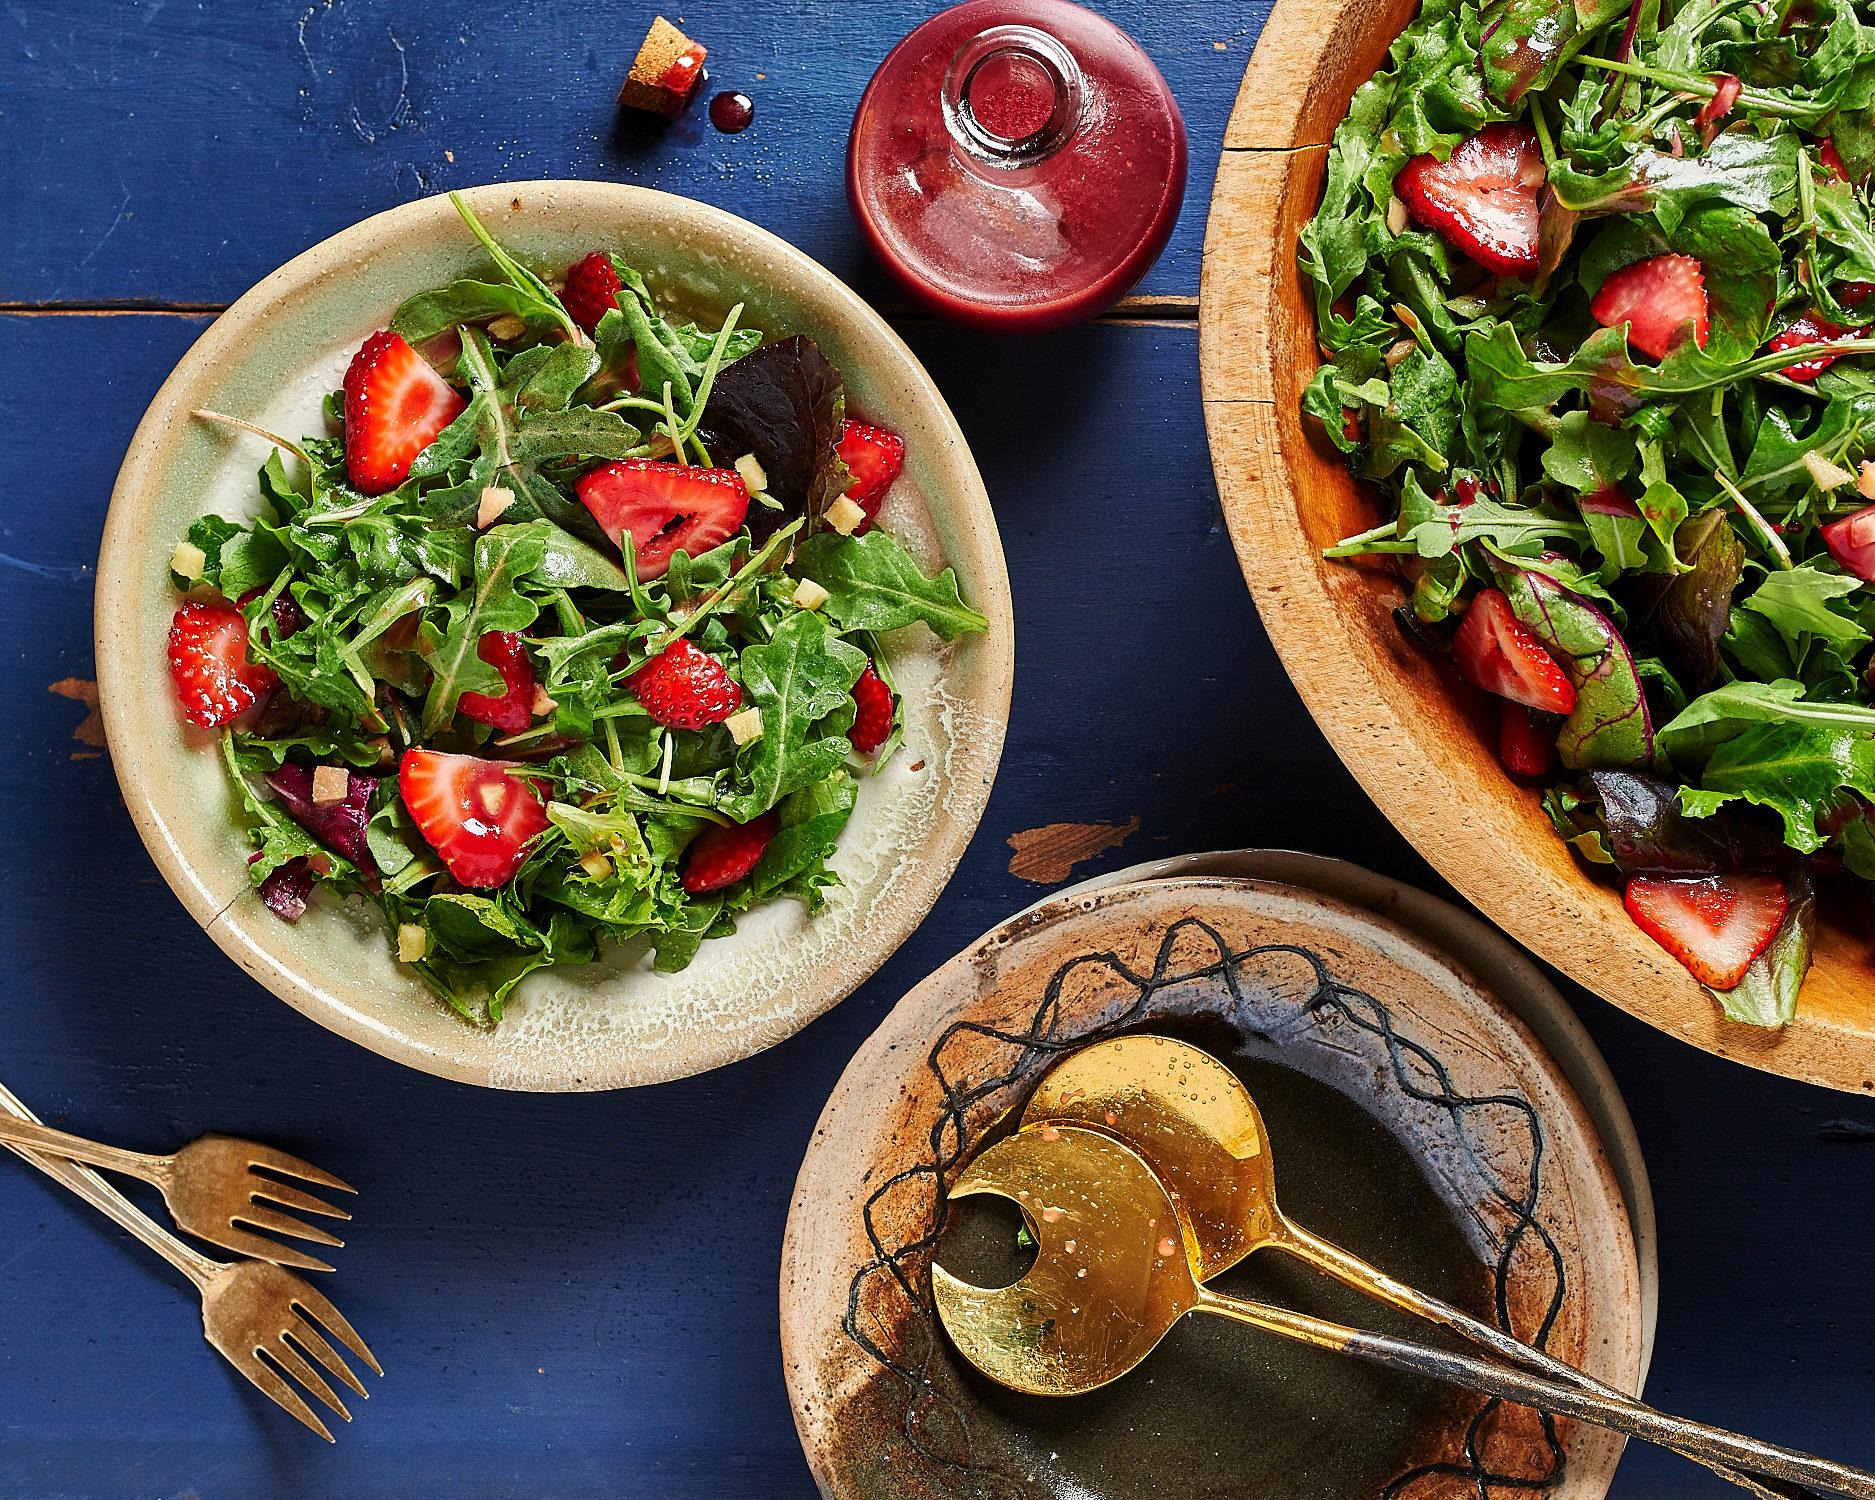 Strawberry Arugula Salad with Dressing